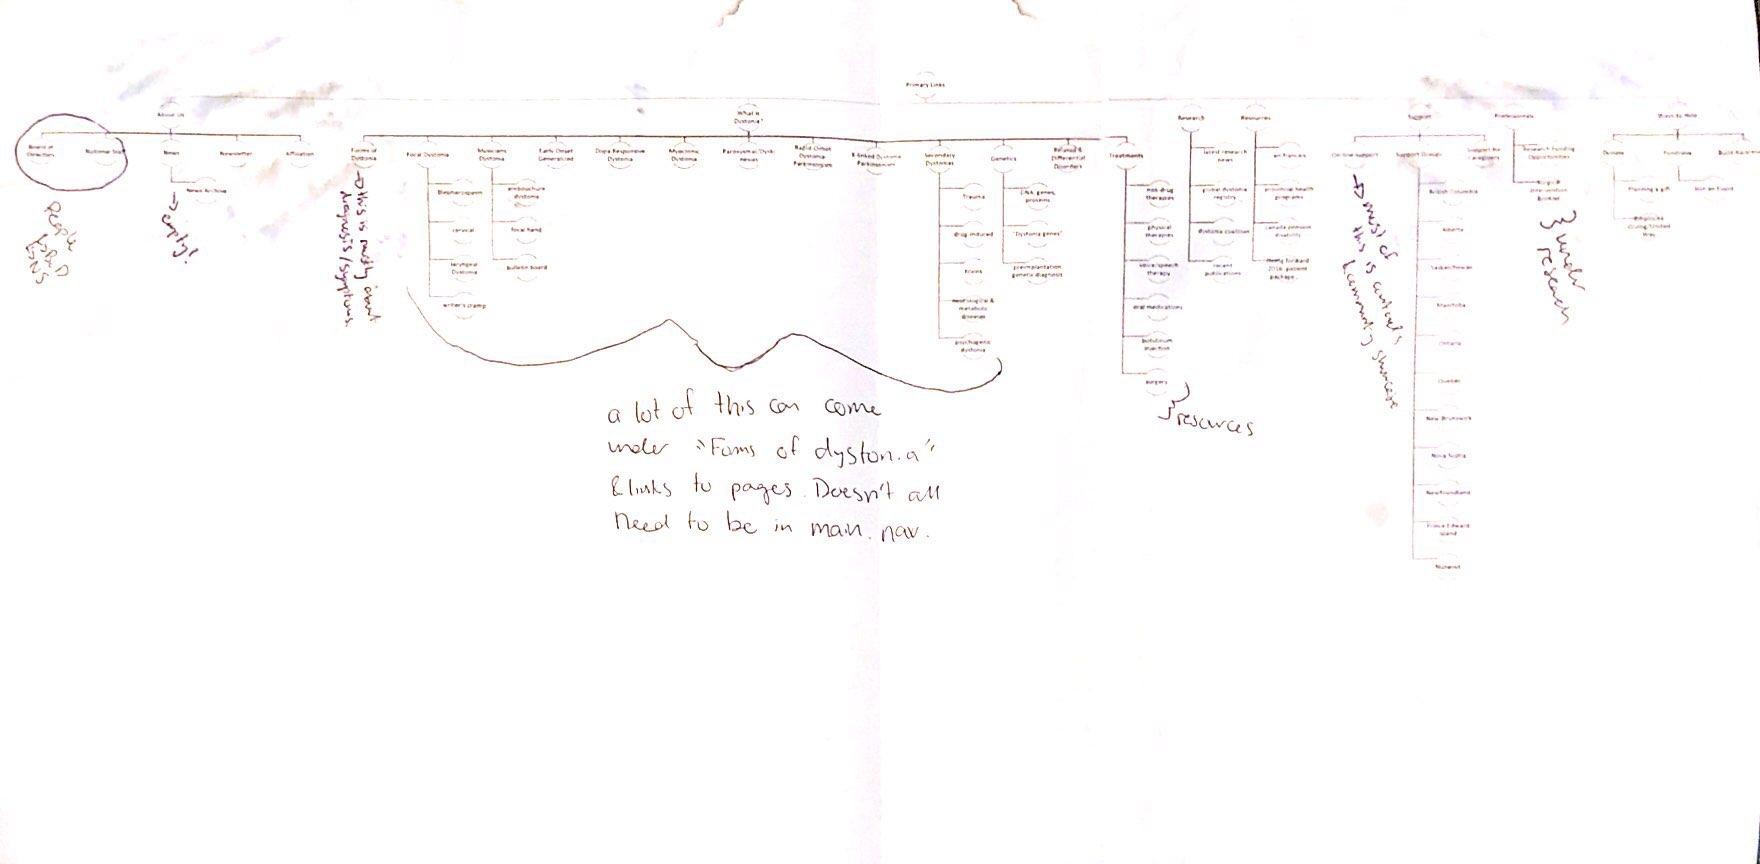 Screenshot of Original Navigation Menu Annotations